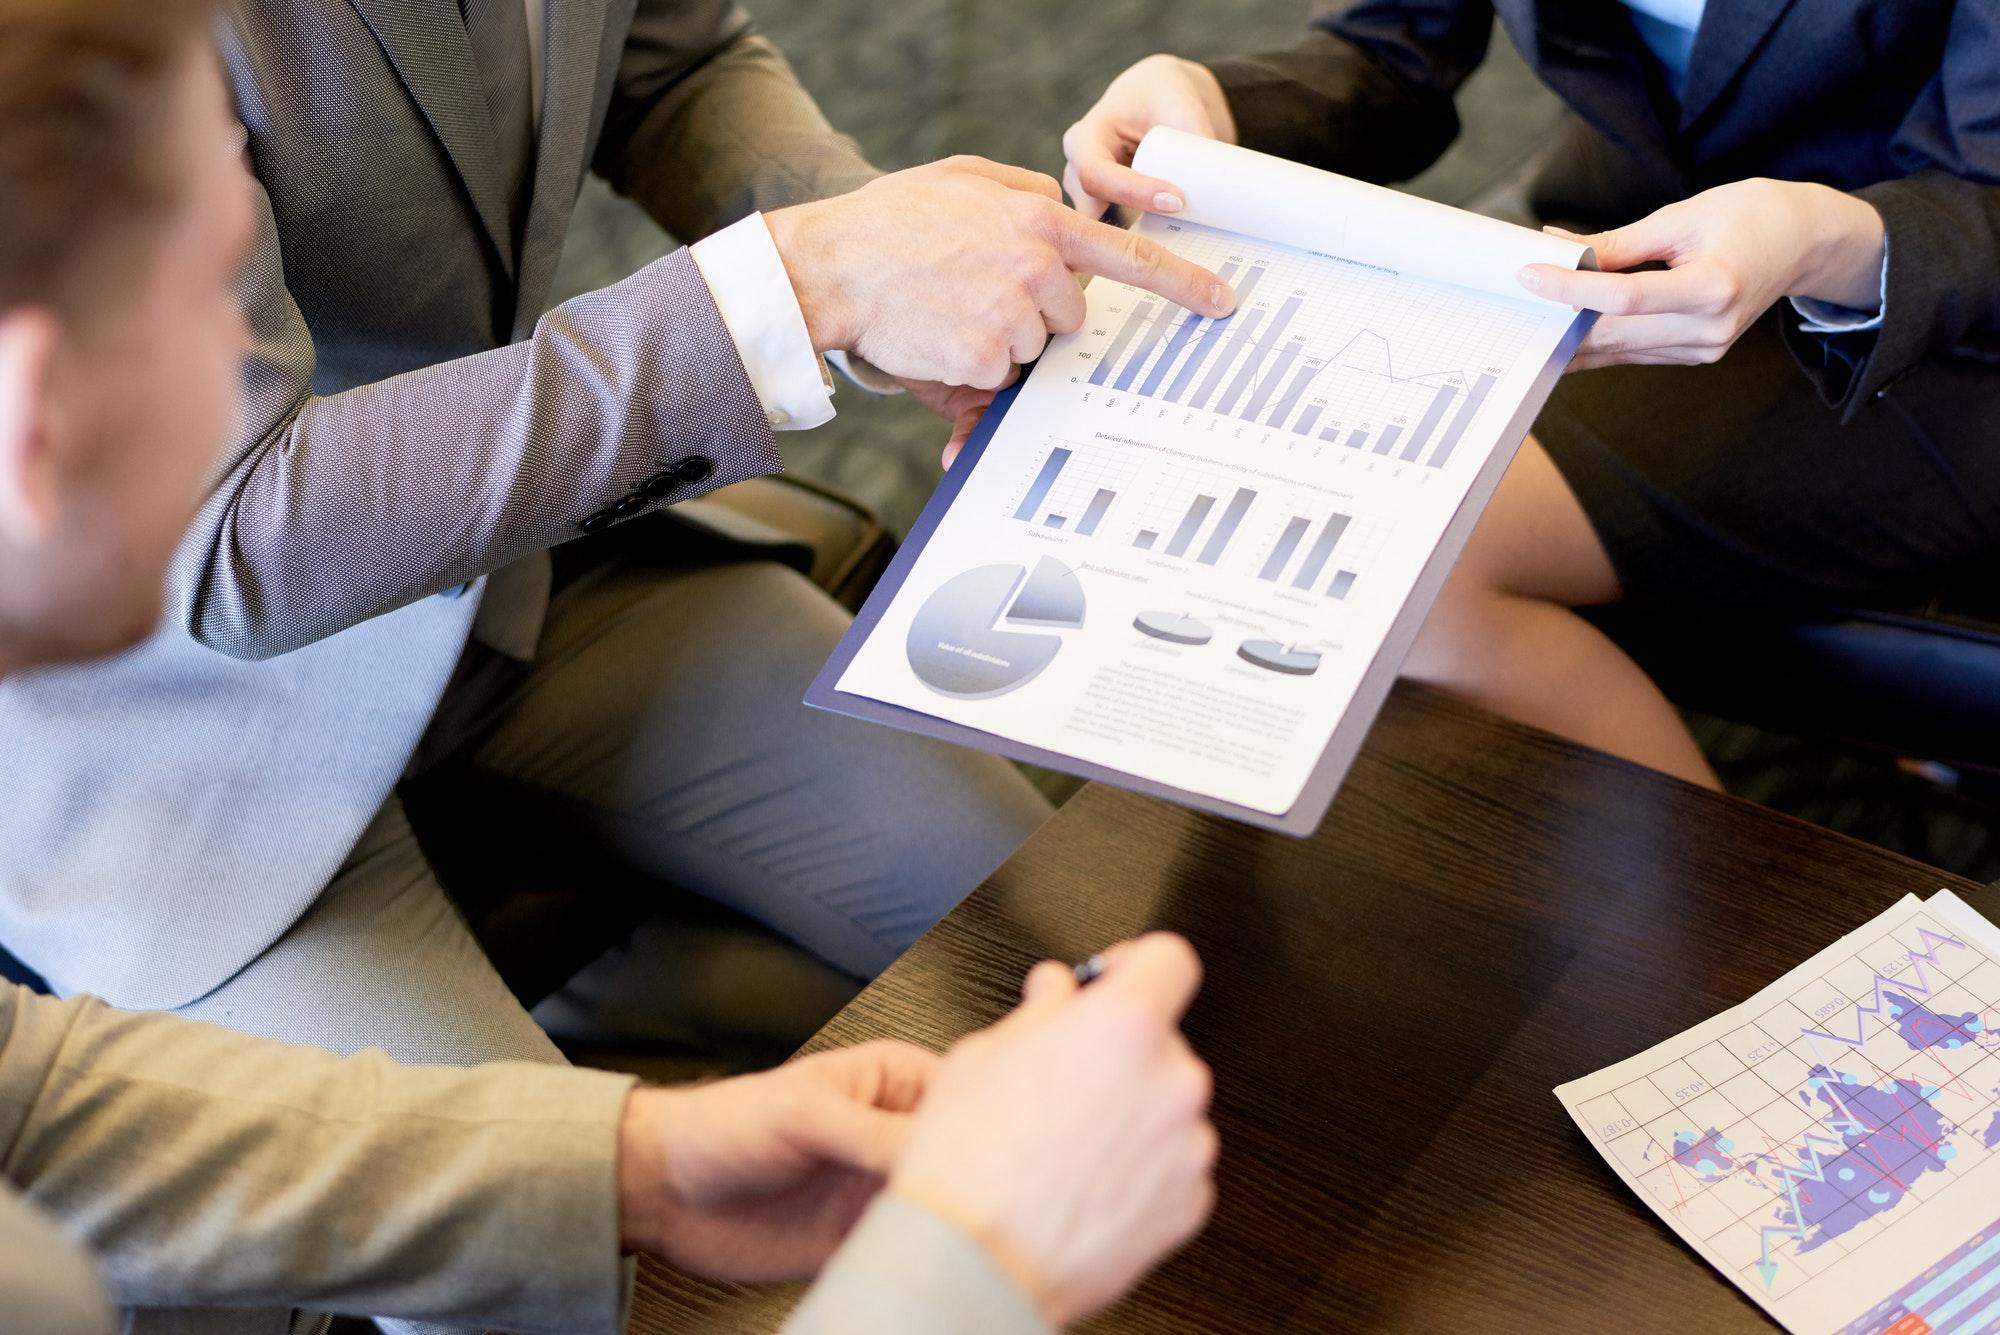 business-meeting-on-marketing.jpg